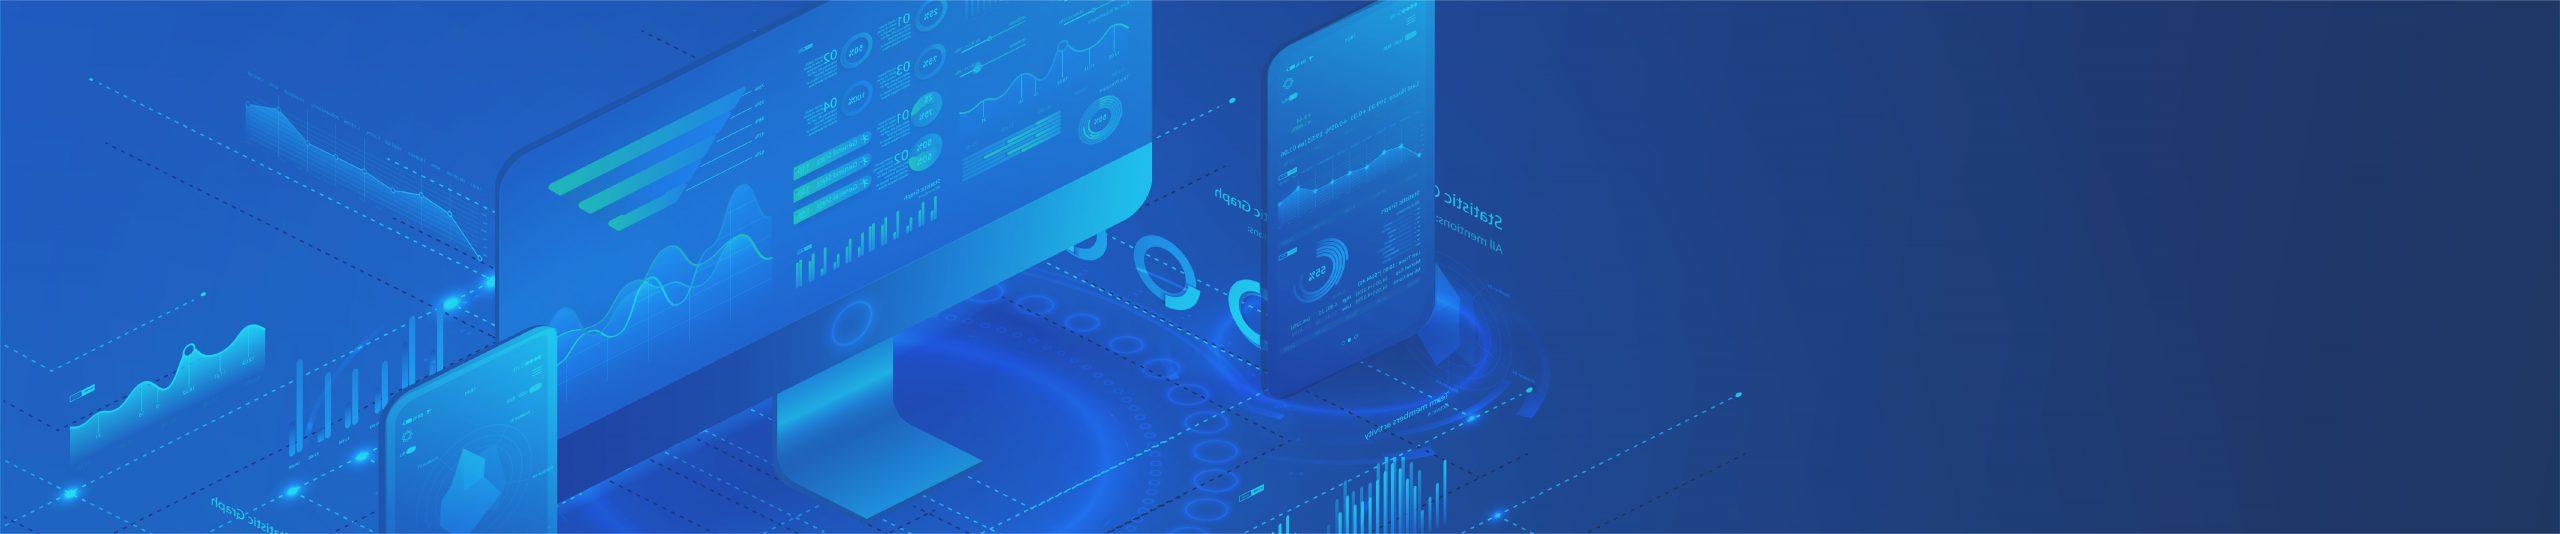 digital service solutions header image